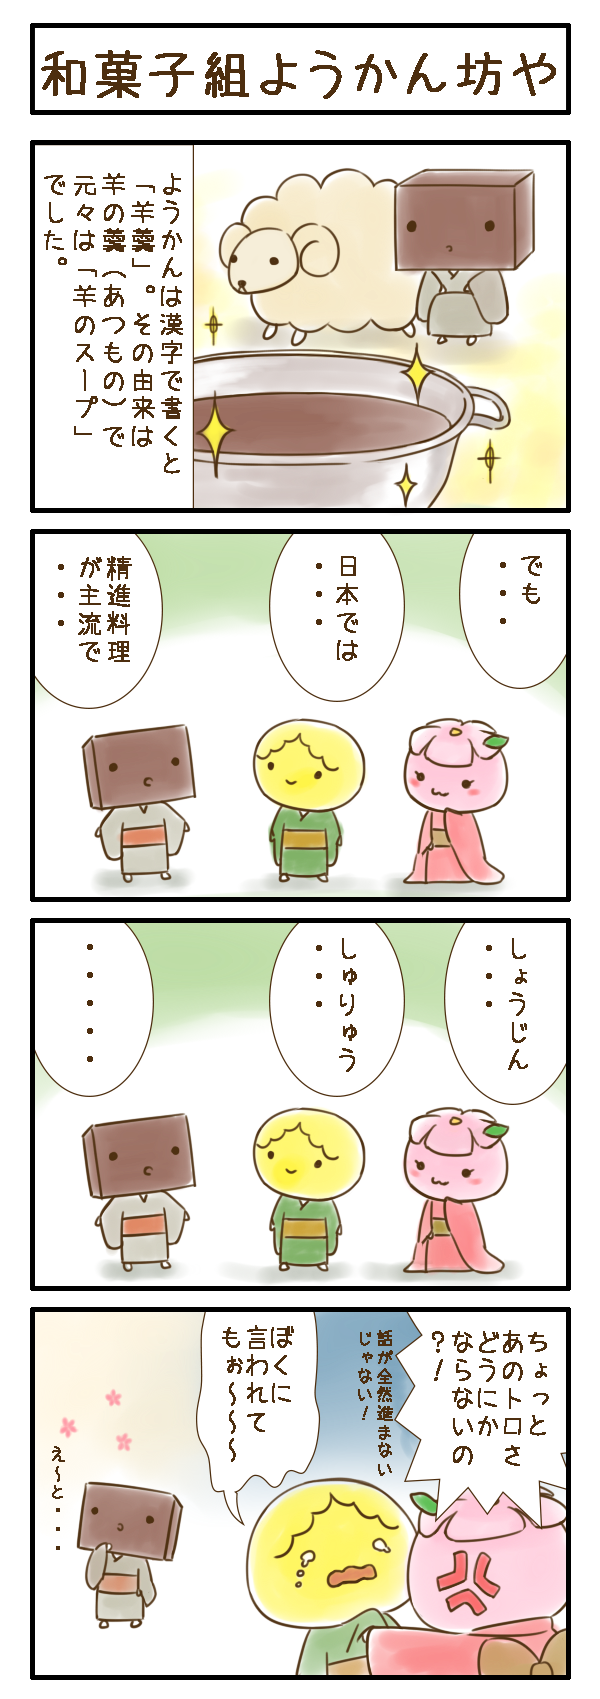 yokan01